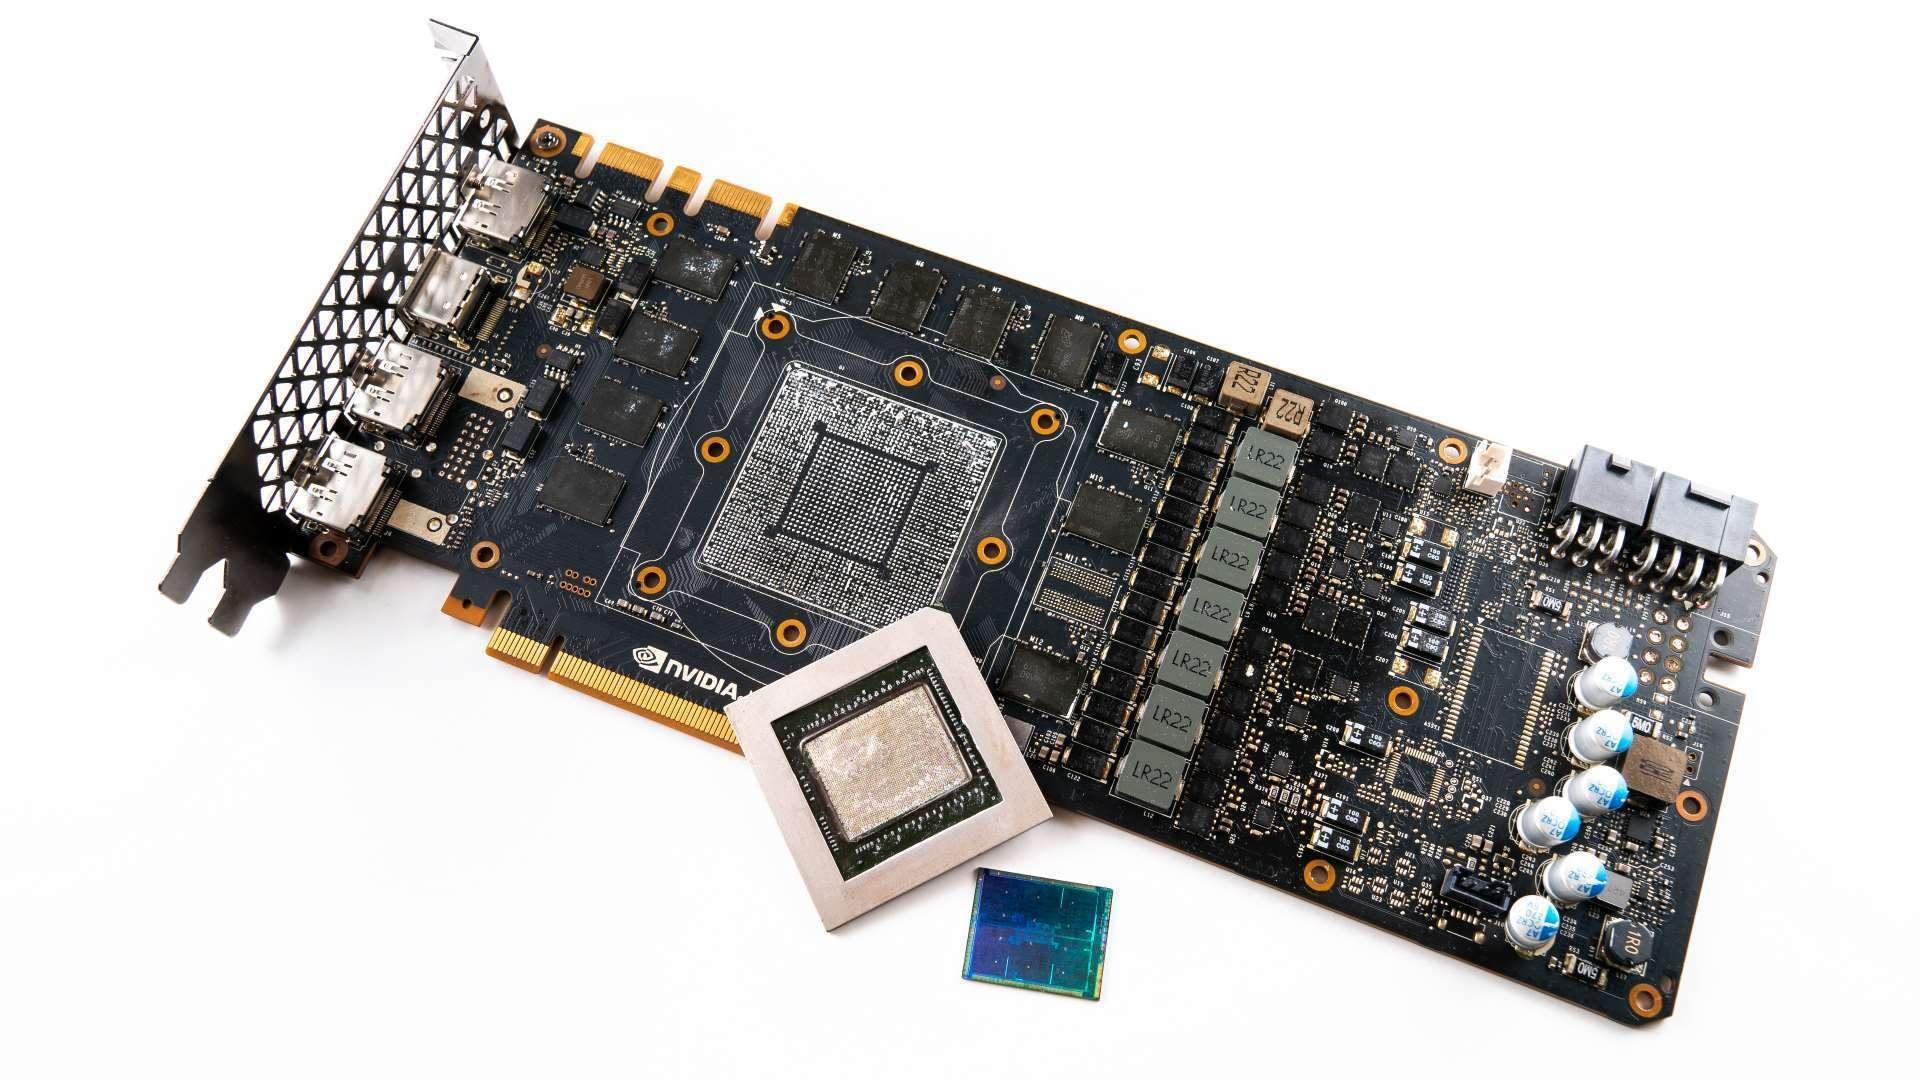 В Китае готовят конкурента NVIDIA GeForce GTX 1080